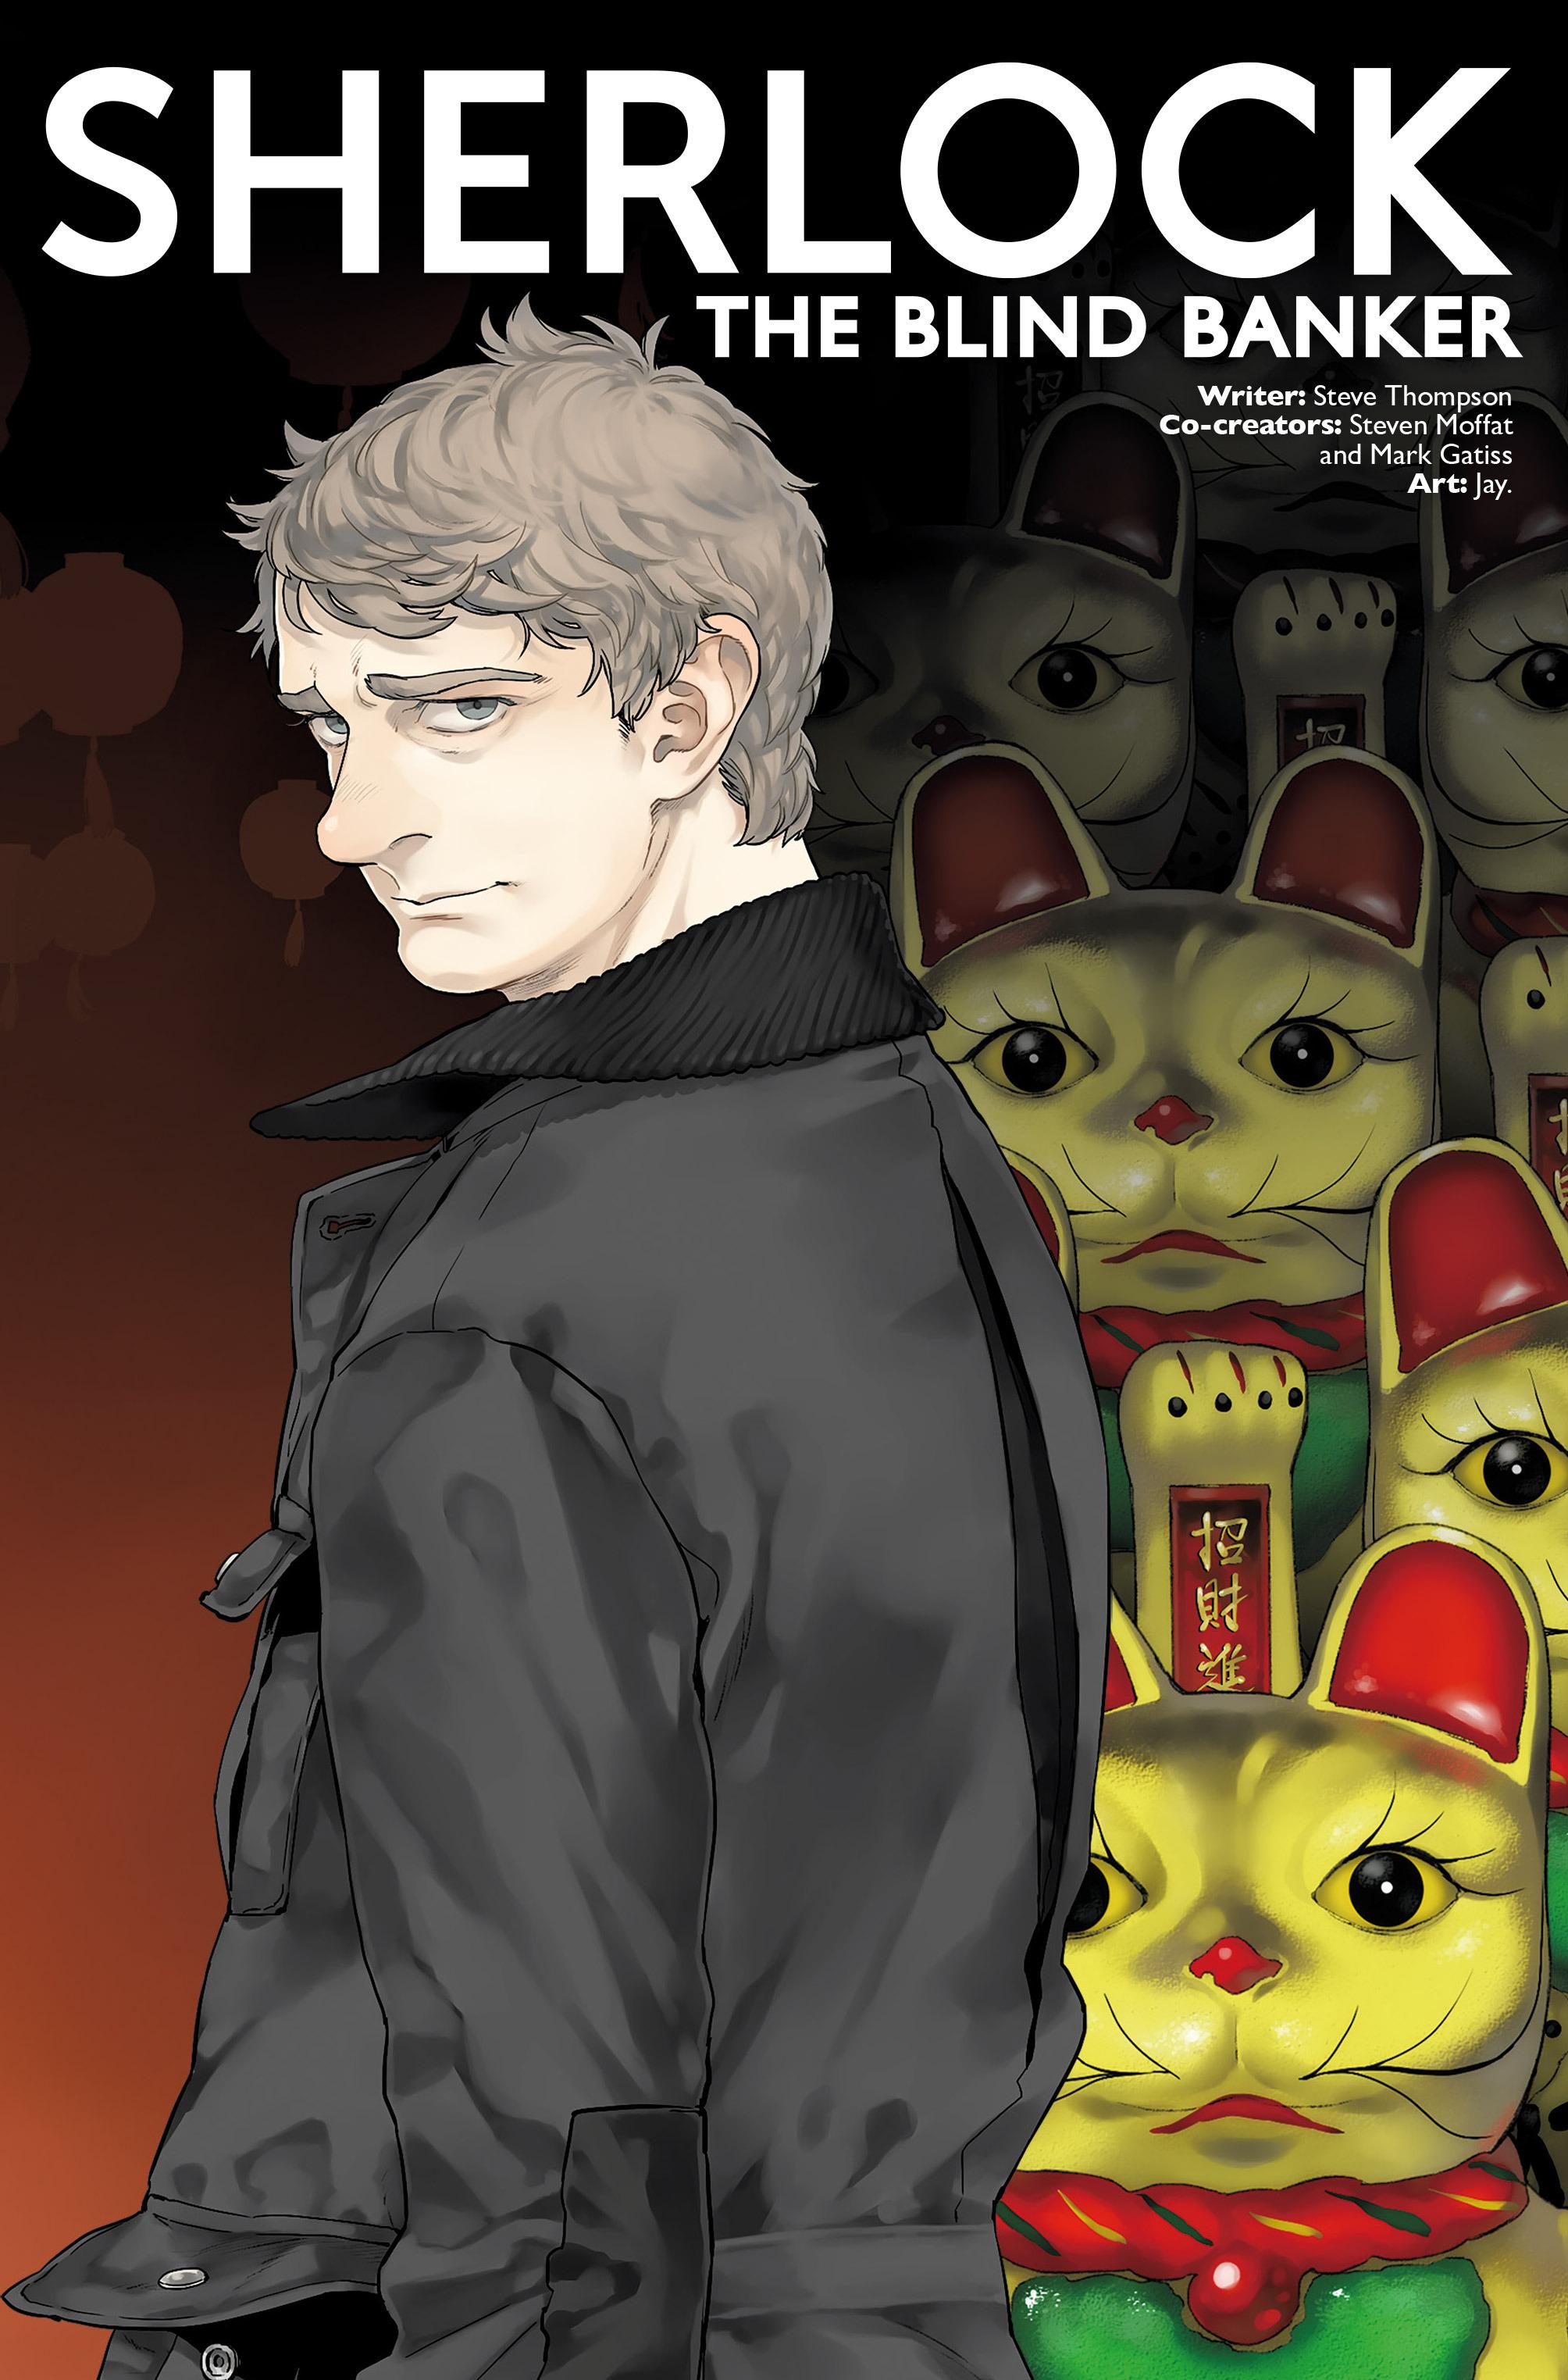 Read online Sherlock: The Blind Banker comic -  Issue #2 - 3